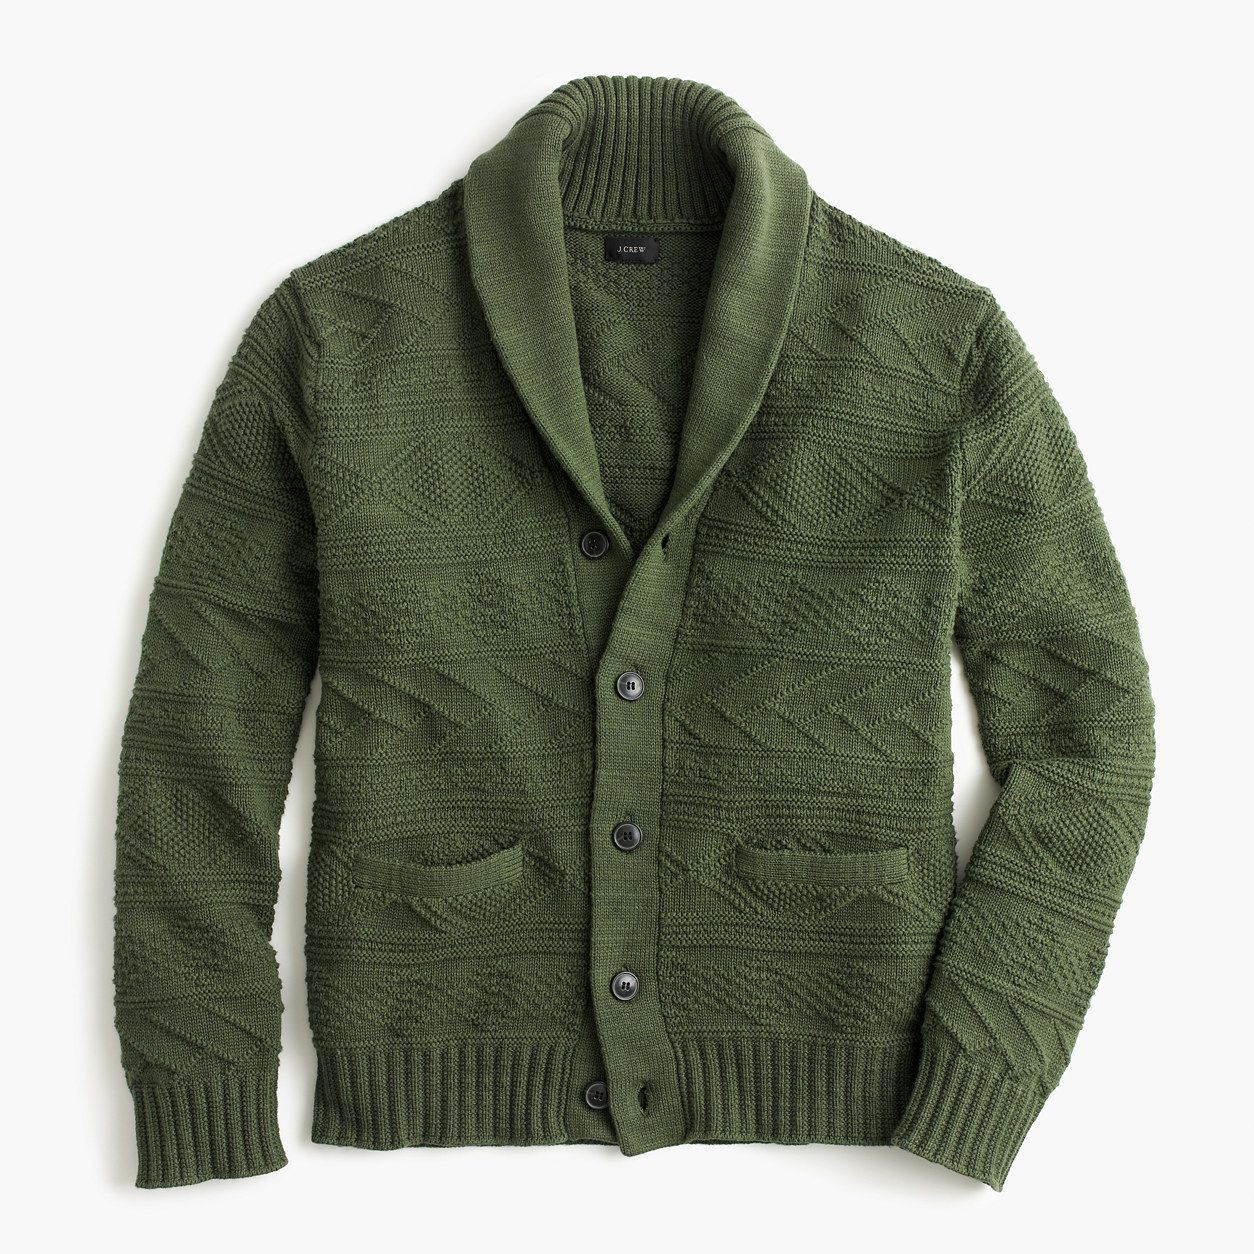 7866ec9b82e2 J.Crew Mens Cotton Guernsey Shawl-Collar Cardigan Sweater (Size XL ...